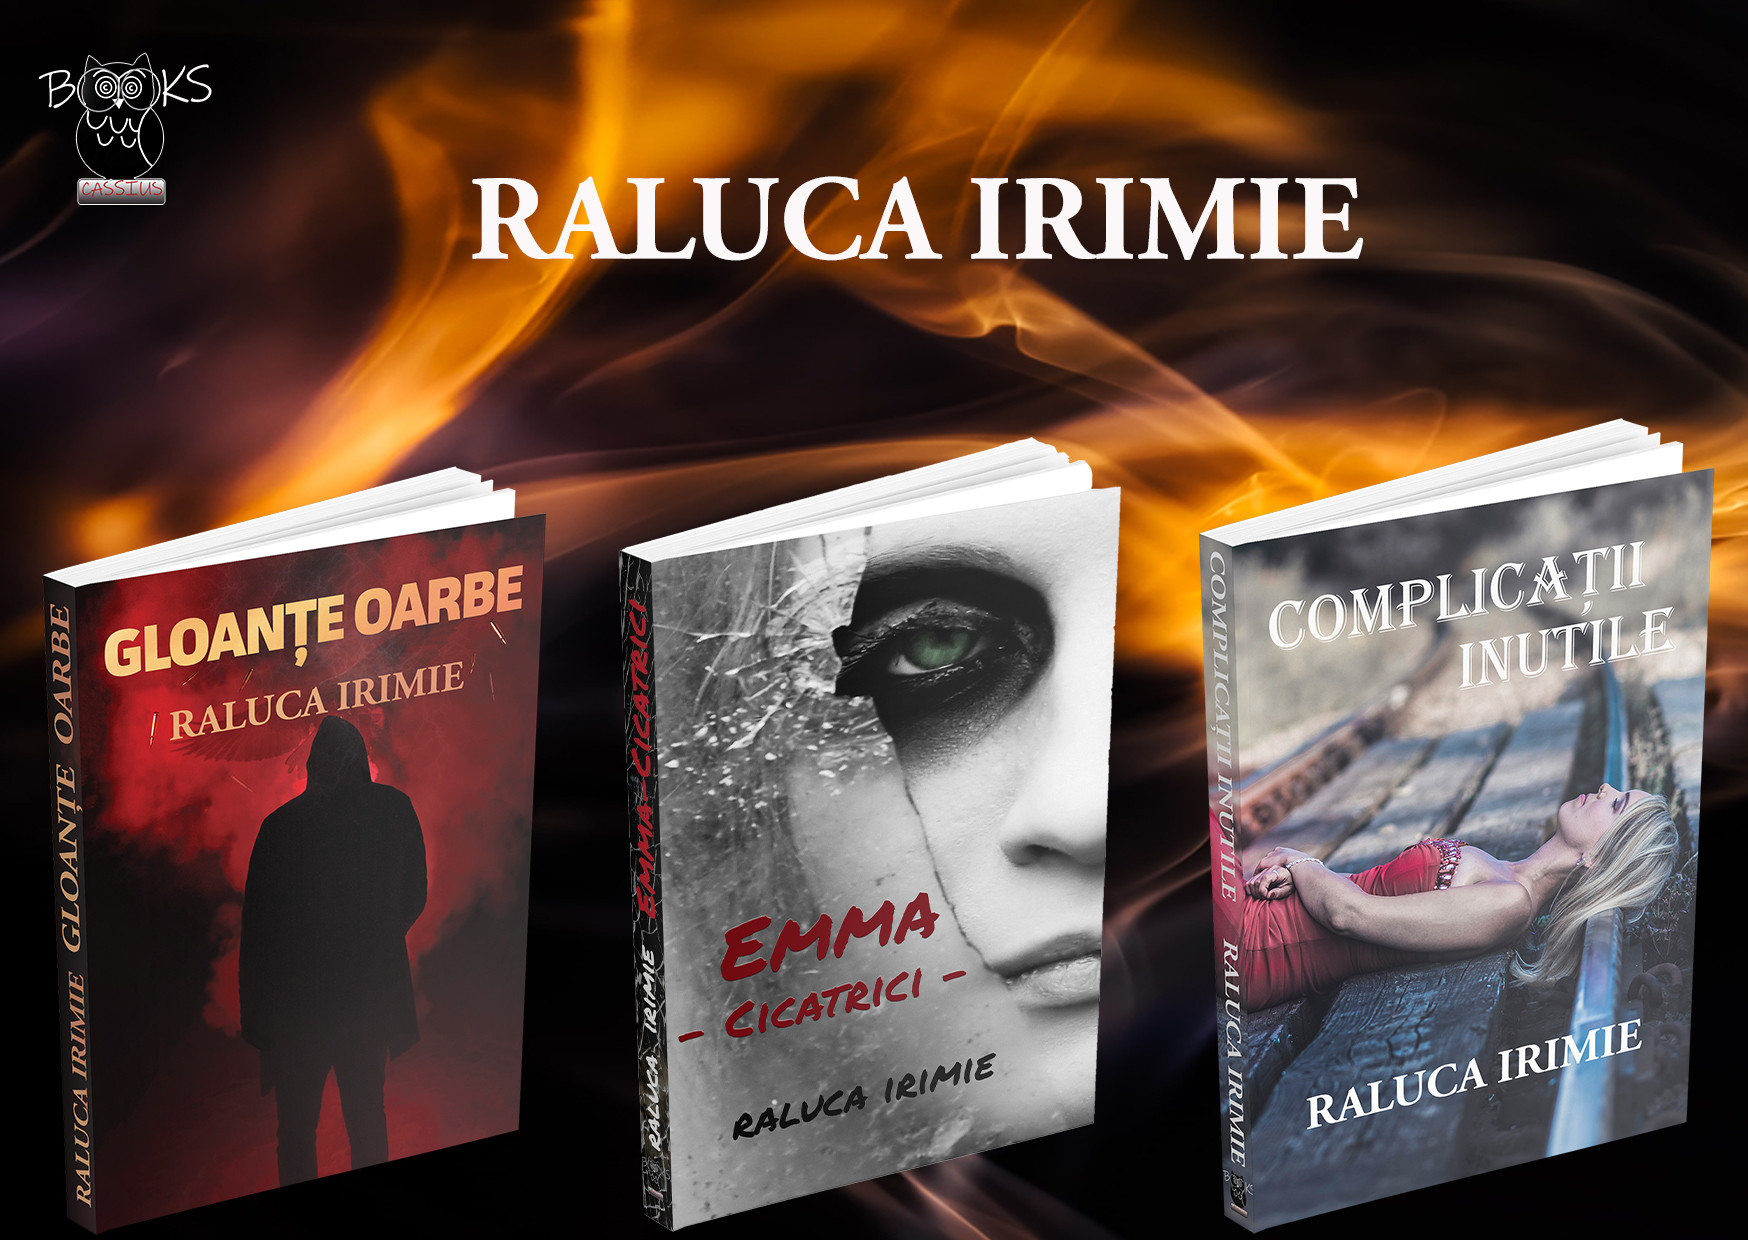 Raluca Irimie